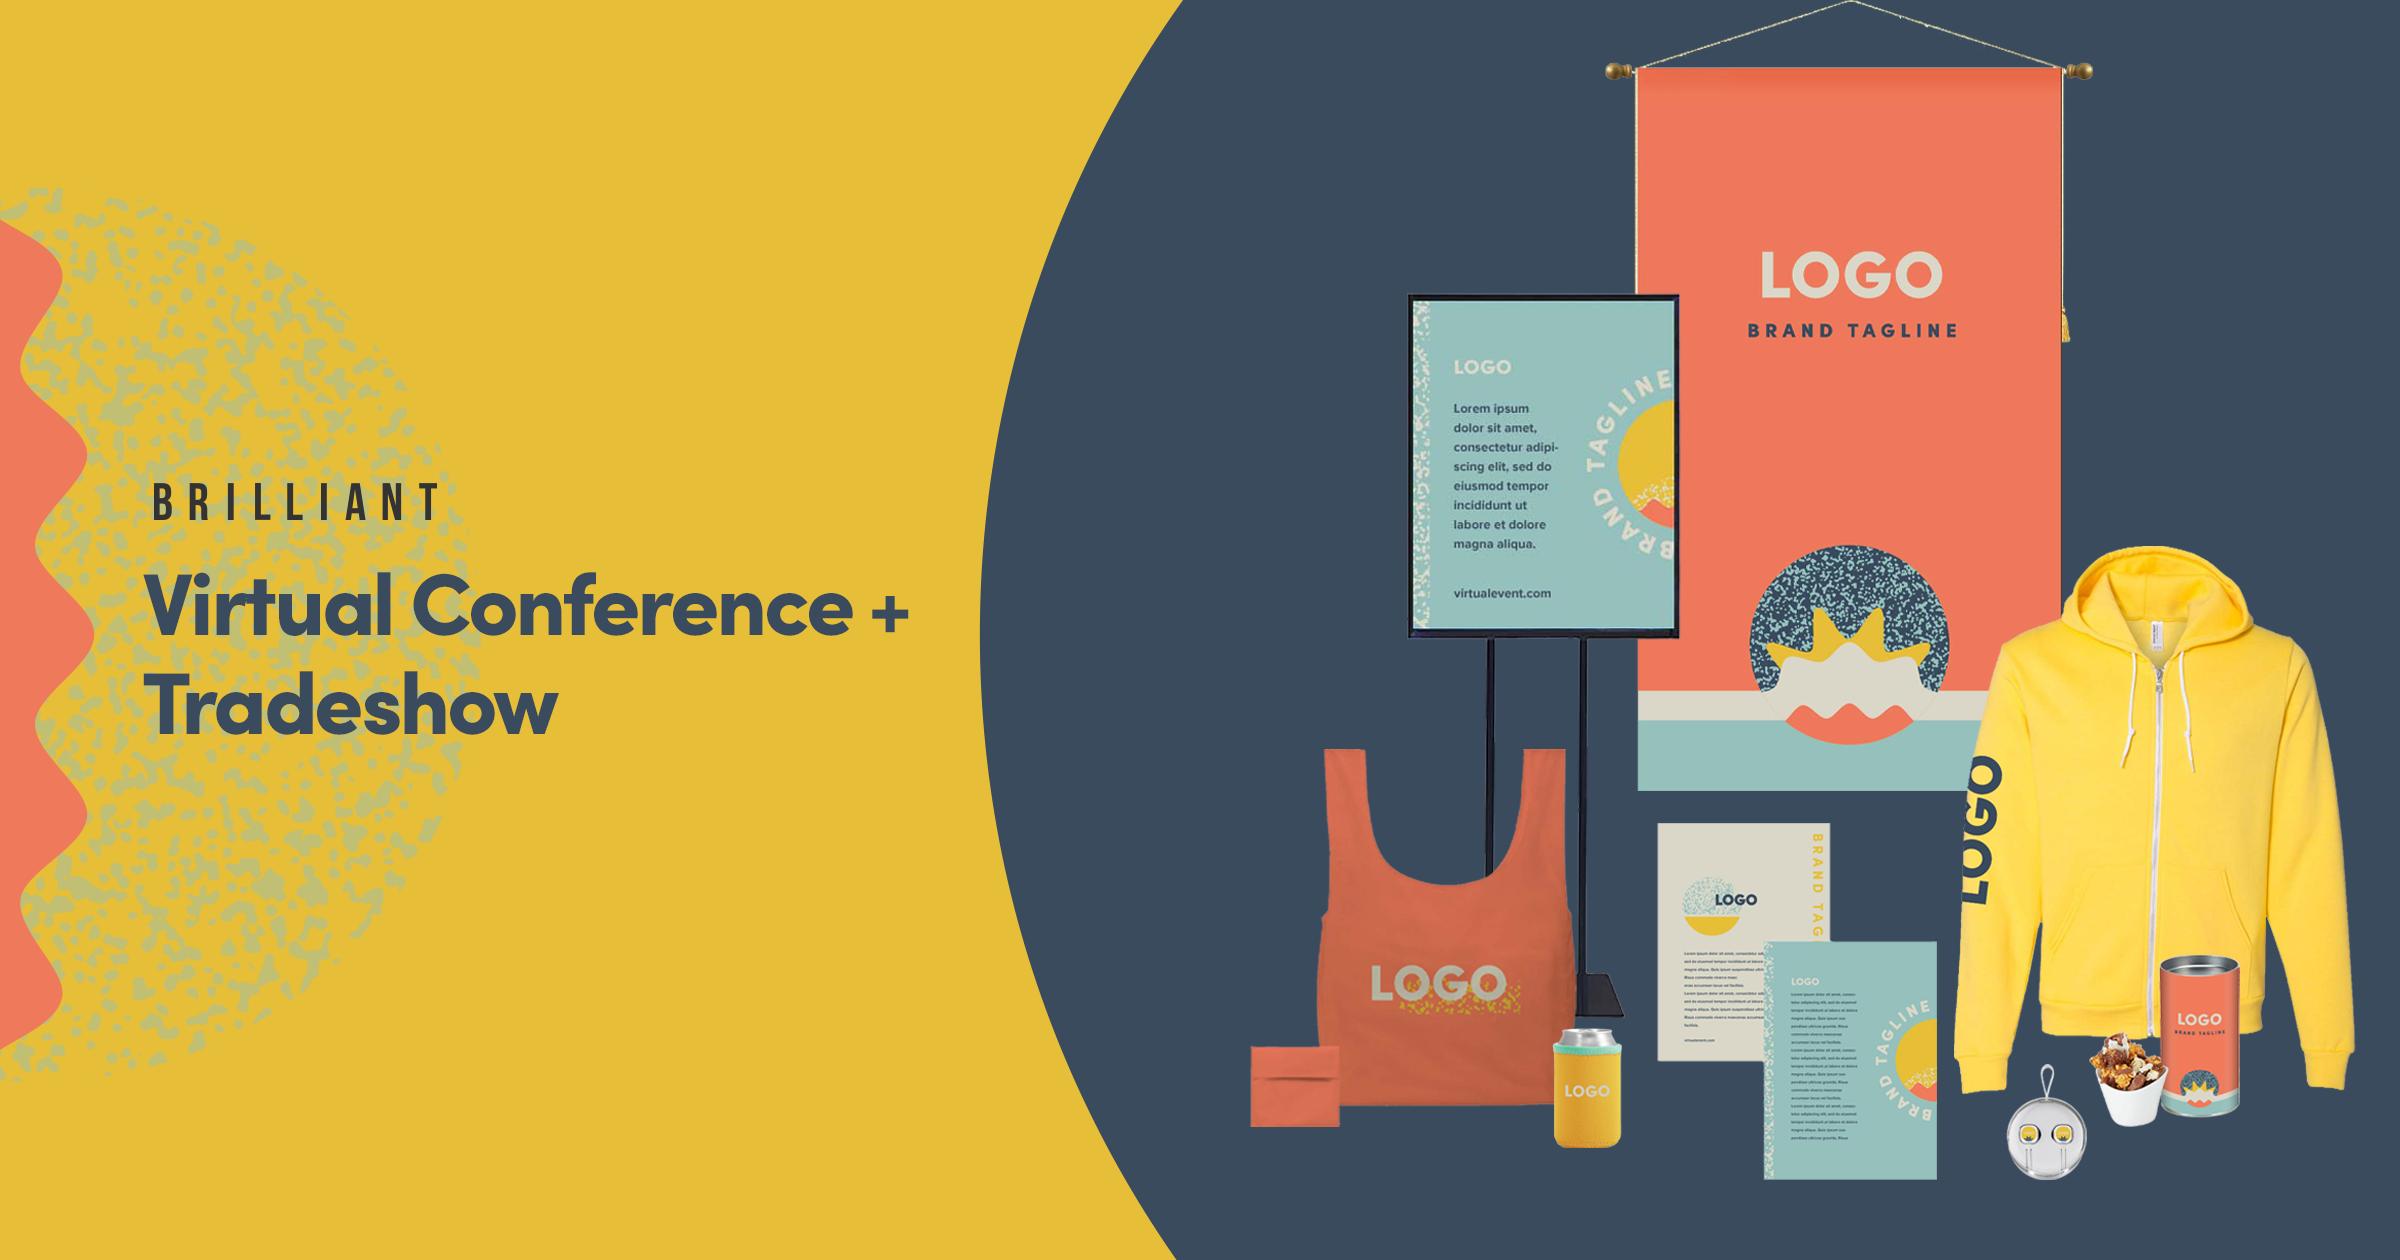 Virtual Conference + Tradeshow